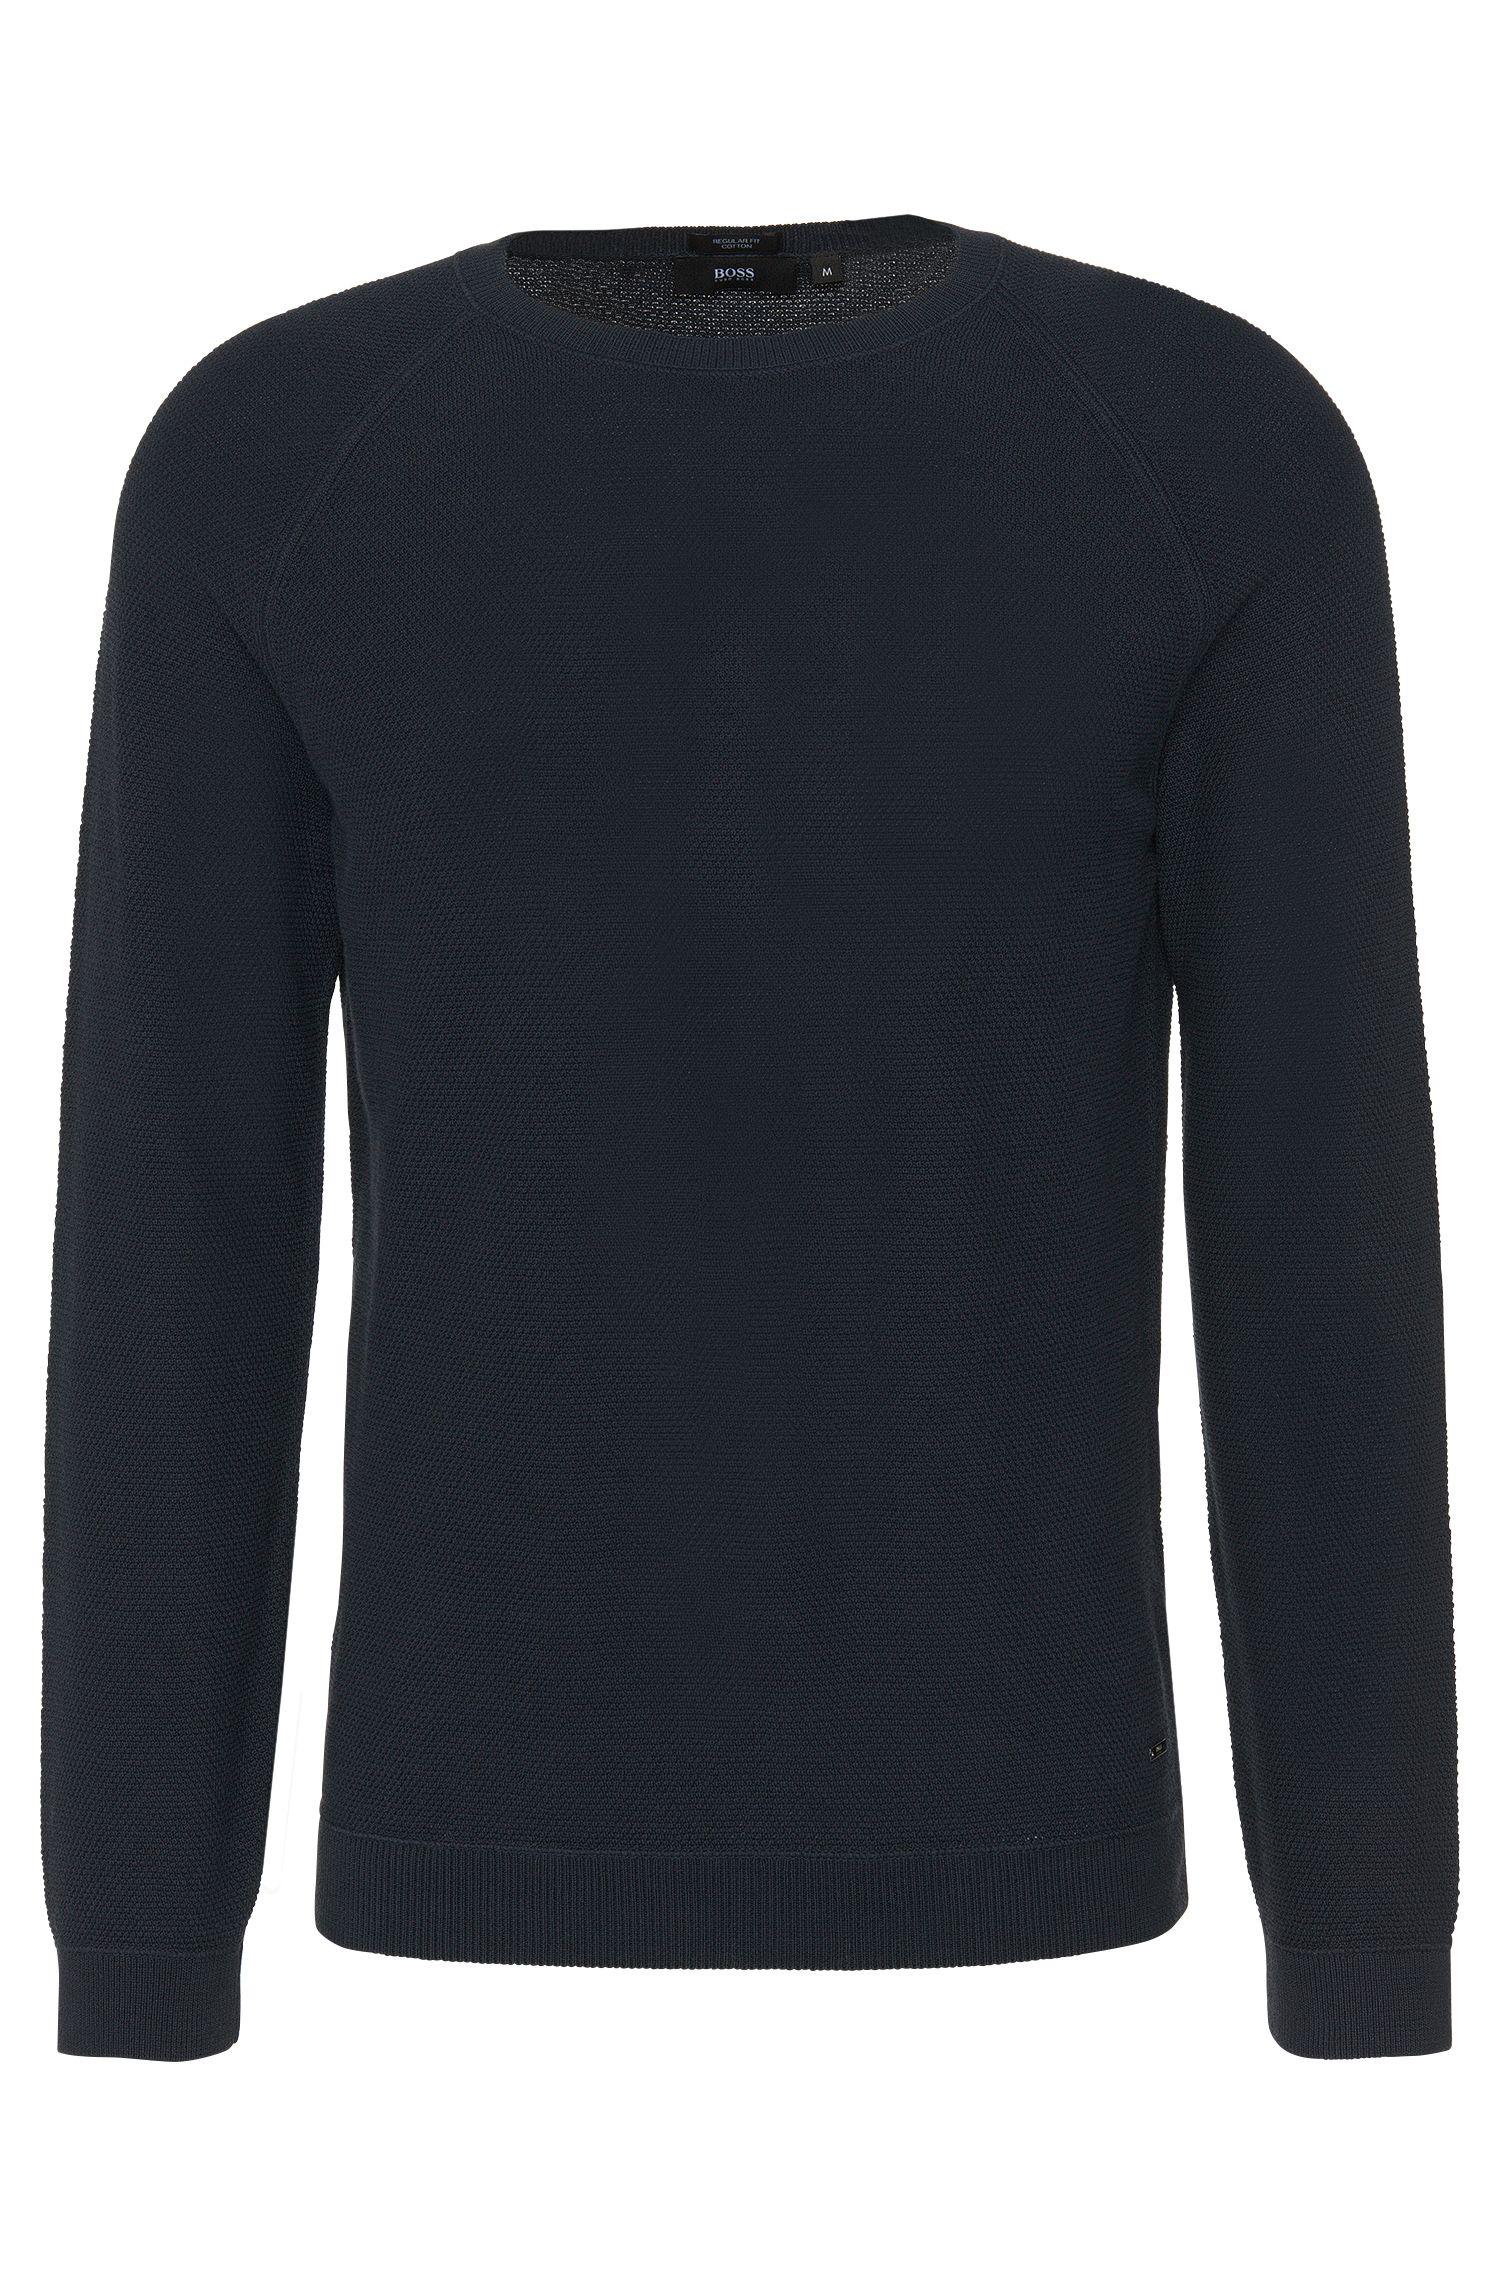 Unifarbener Regular-Fit Pullover aus Baumwolle: 'Ilian'